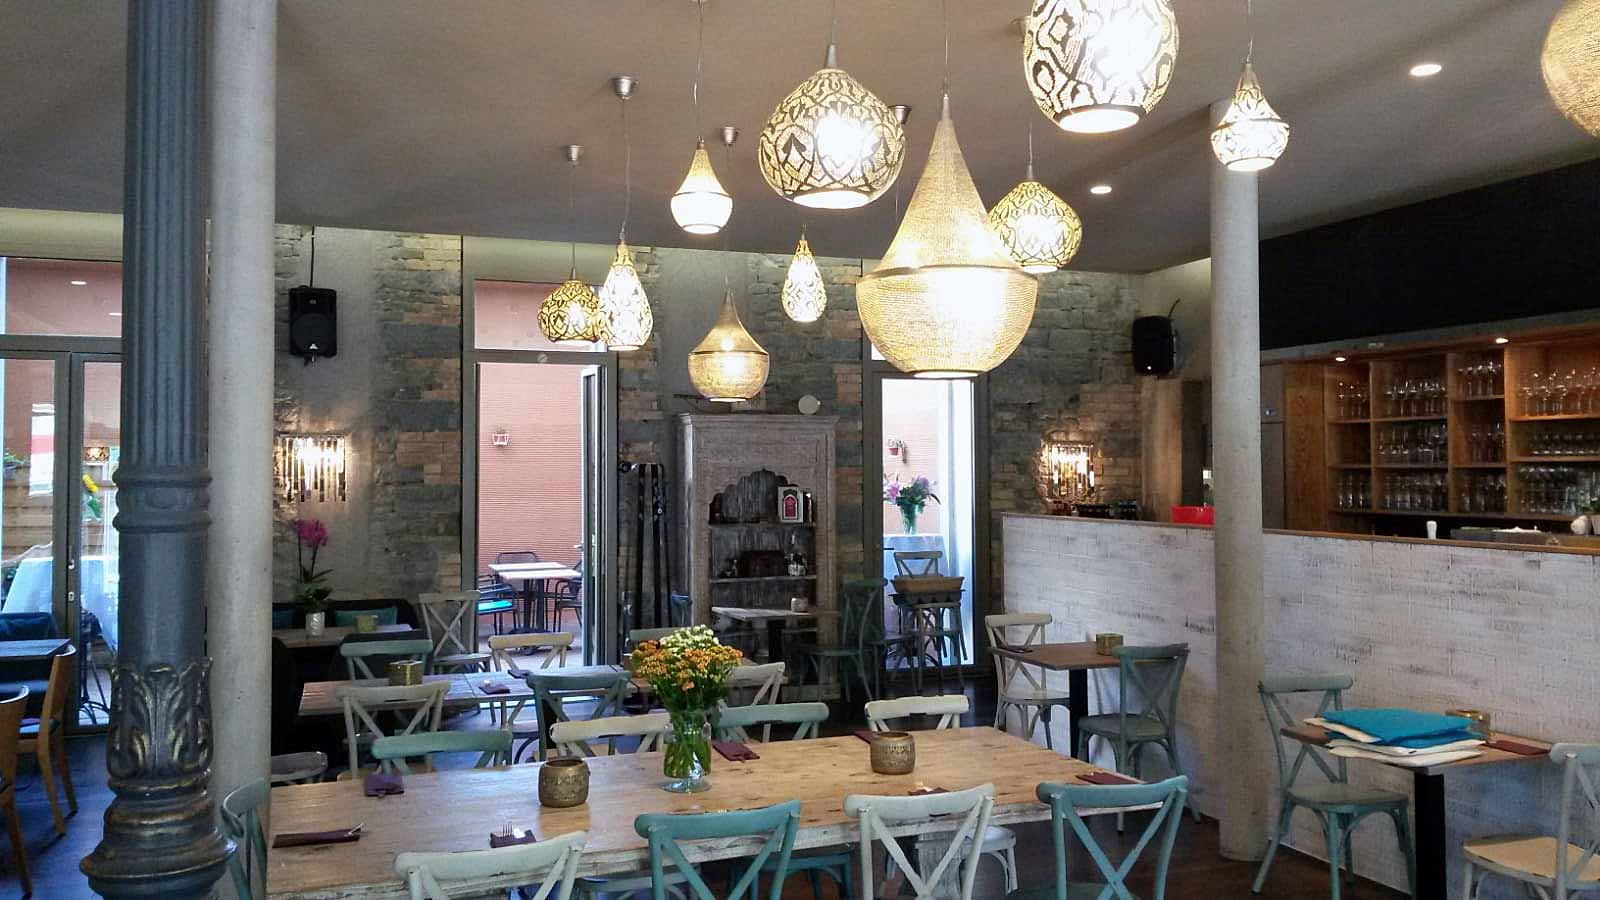 Orientalische Beleuchtung ikrams Restaurant